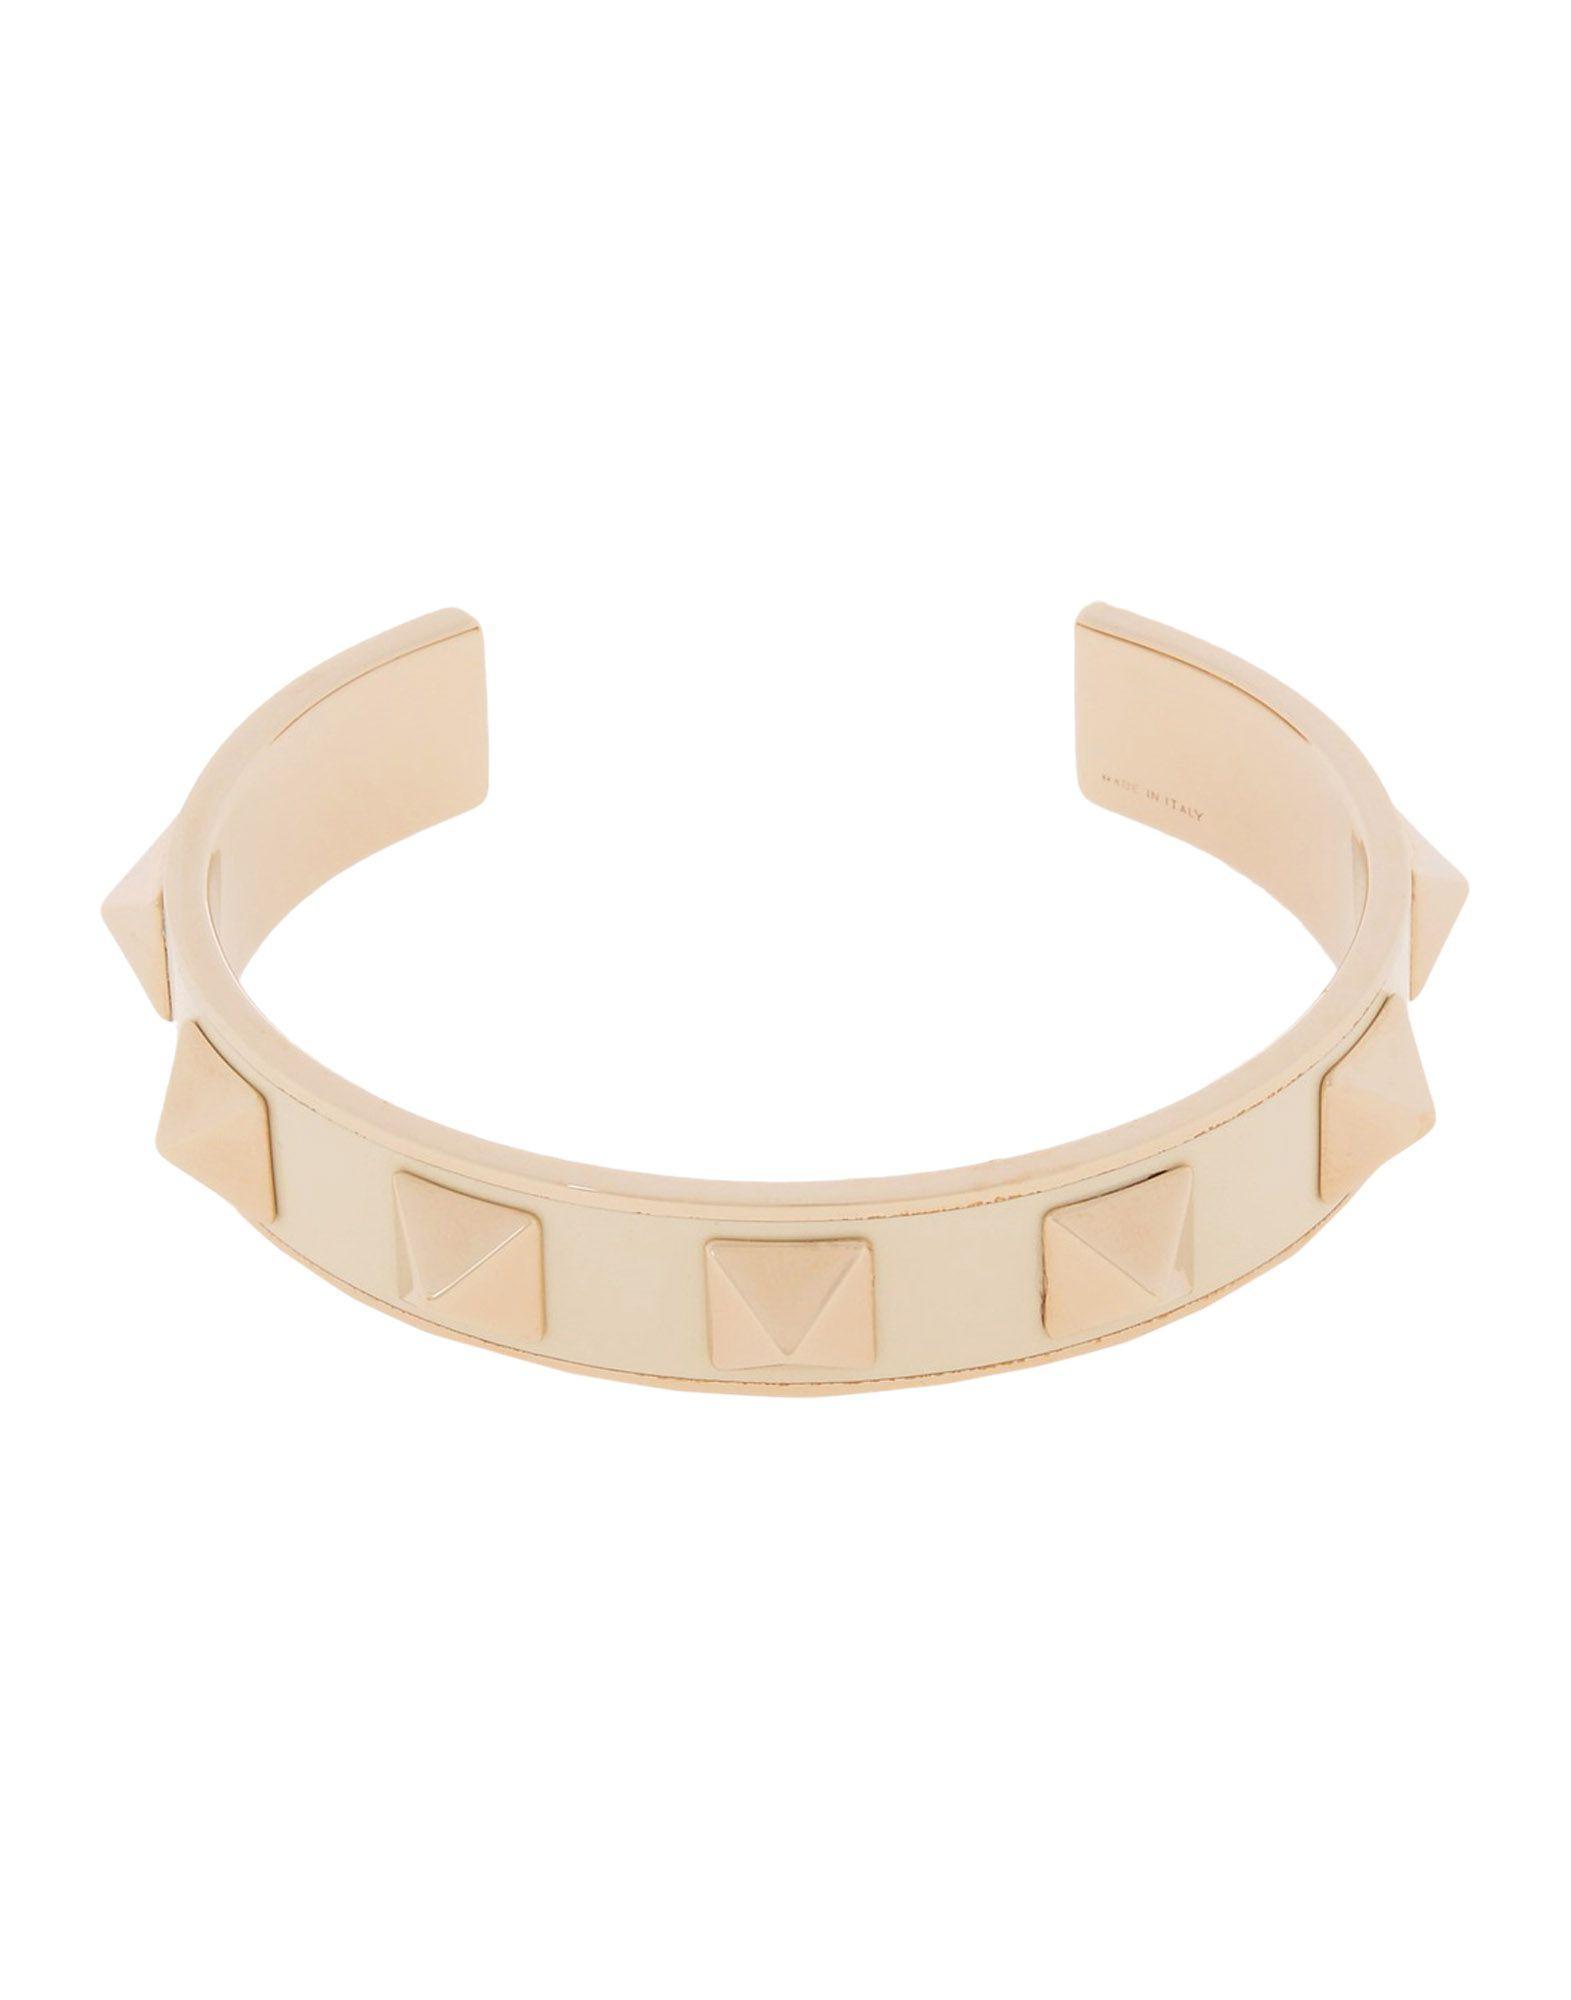 Valentino Bracelets In Ivory